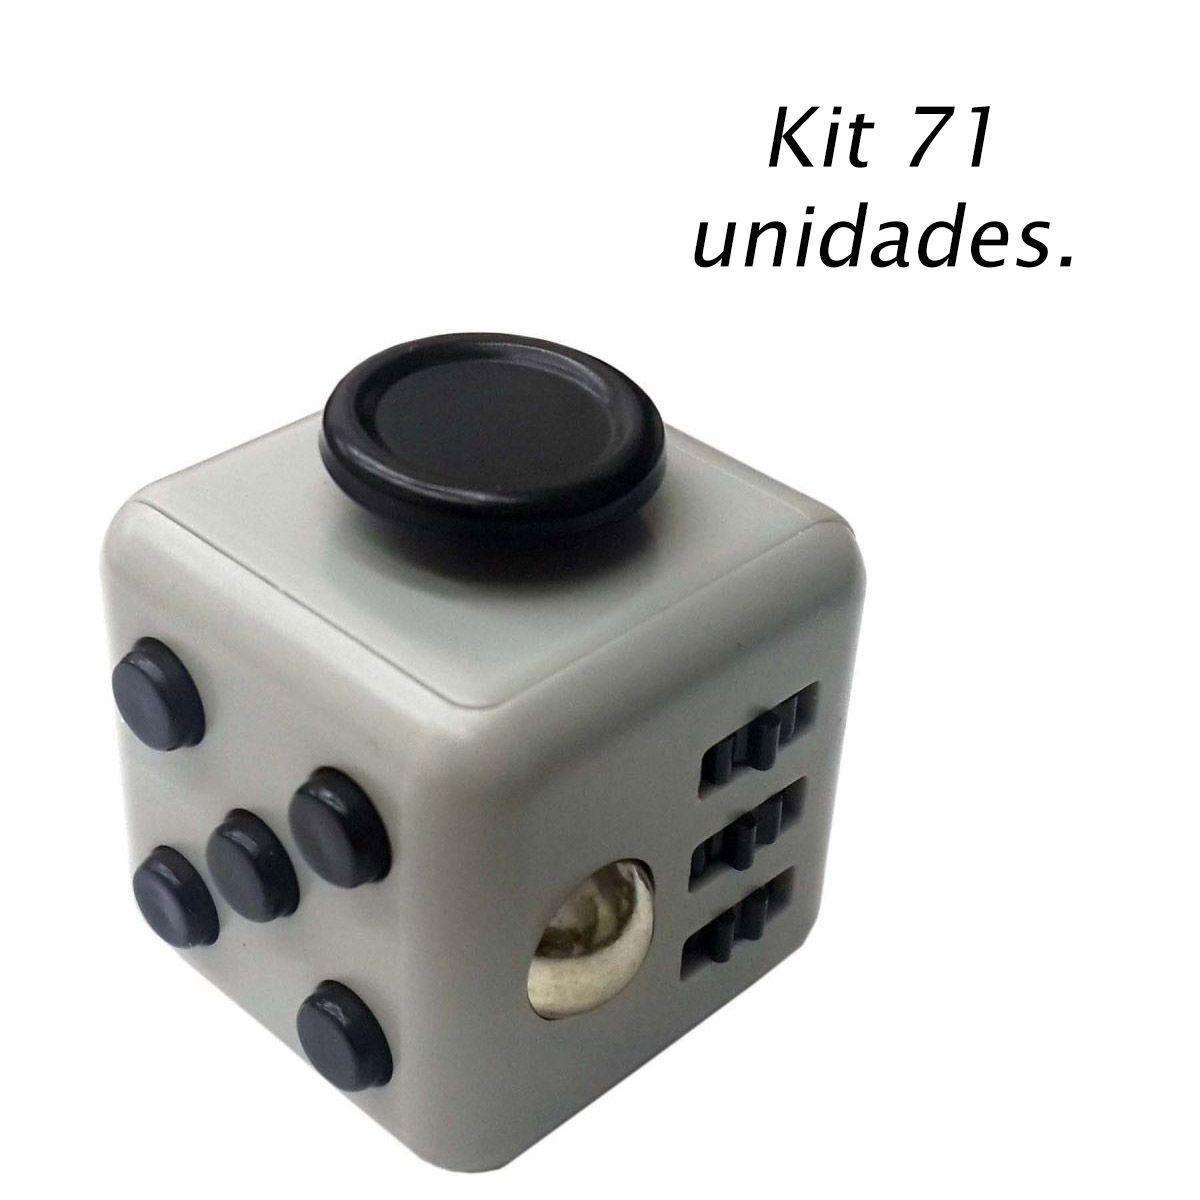 Kit 71 Fidget Cubo Para Ansiedade Cube Anti Estresse Dedo Apertar Cinza (BSL-GIRA-3)